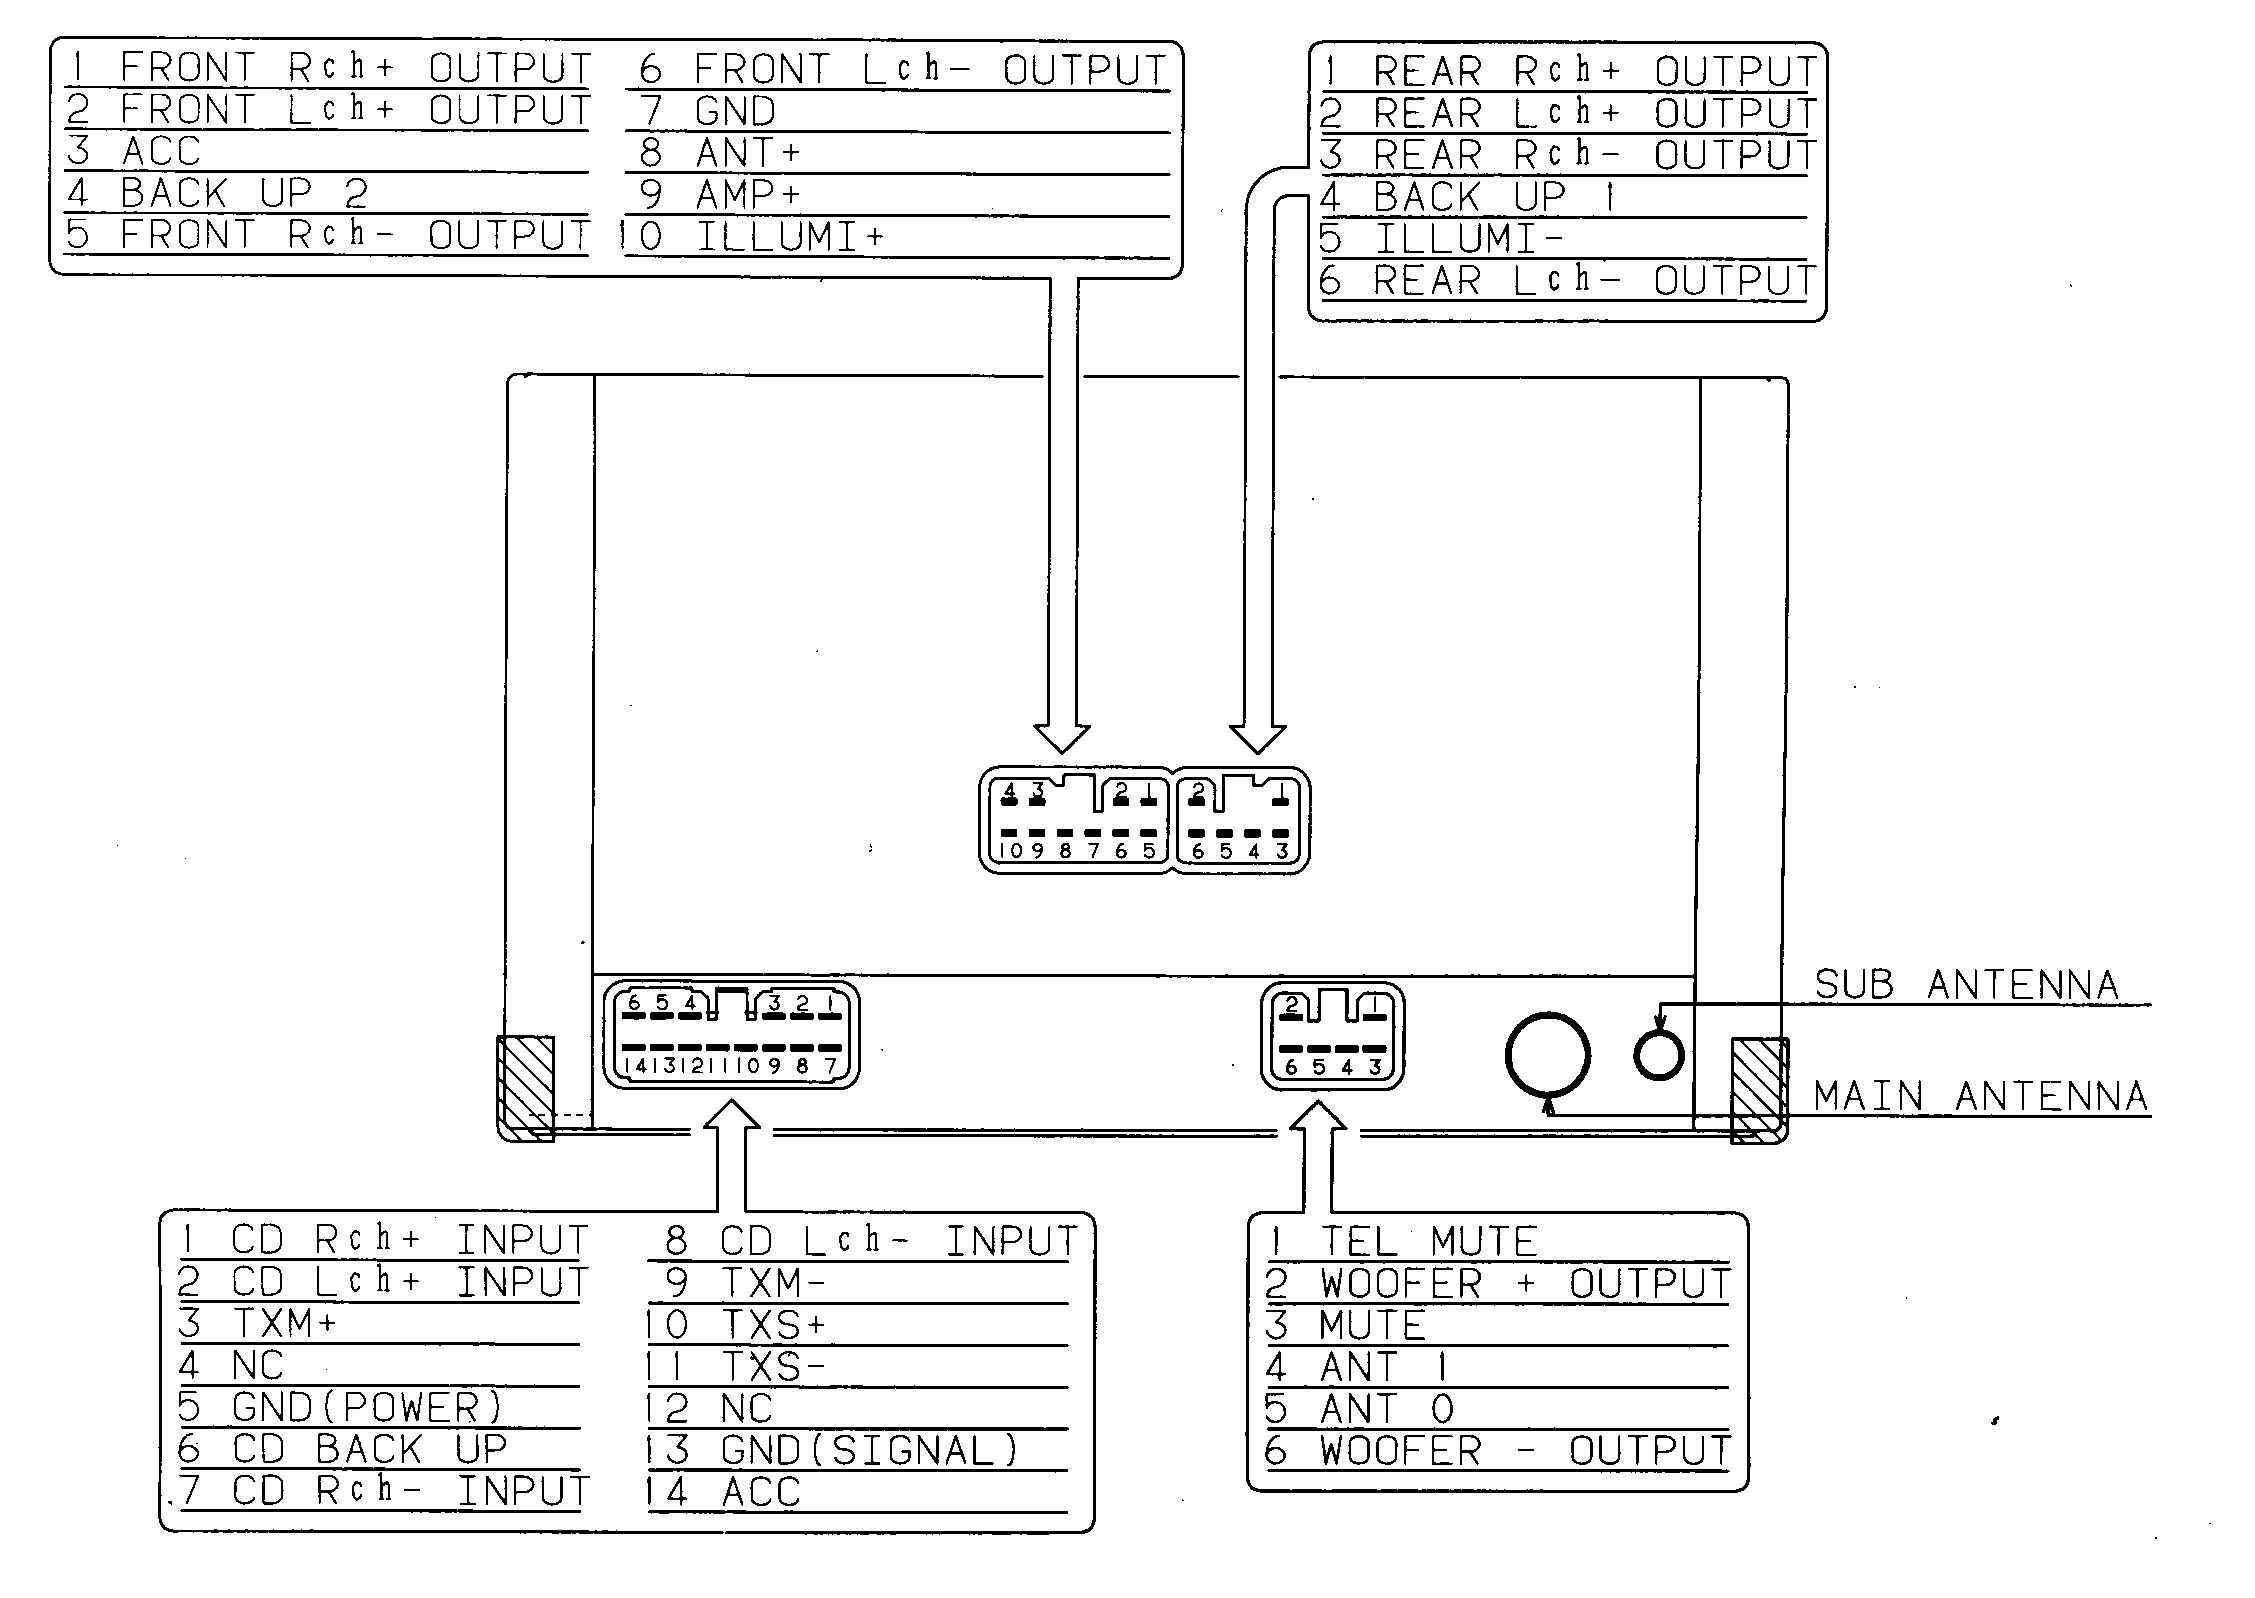 wiring diagram for fujitsu ten car stereo valid sony xplod radio atwiring diagram for fujitsu ten